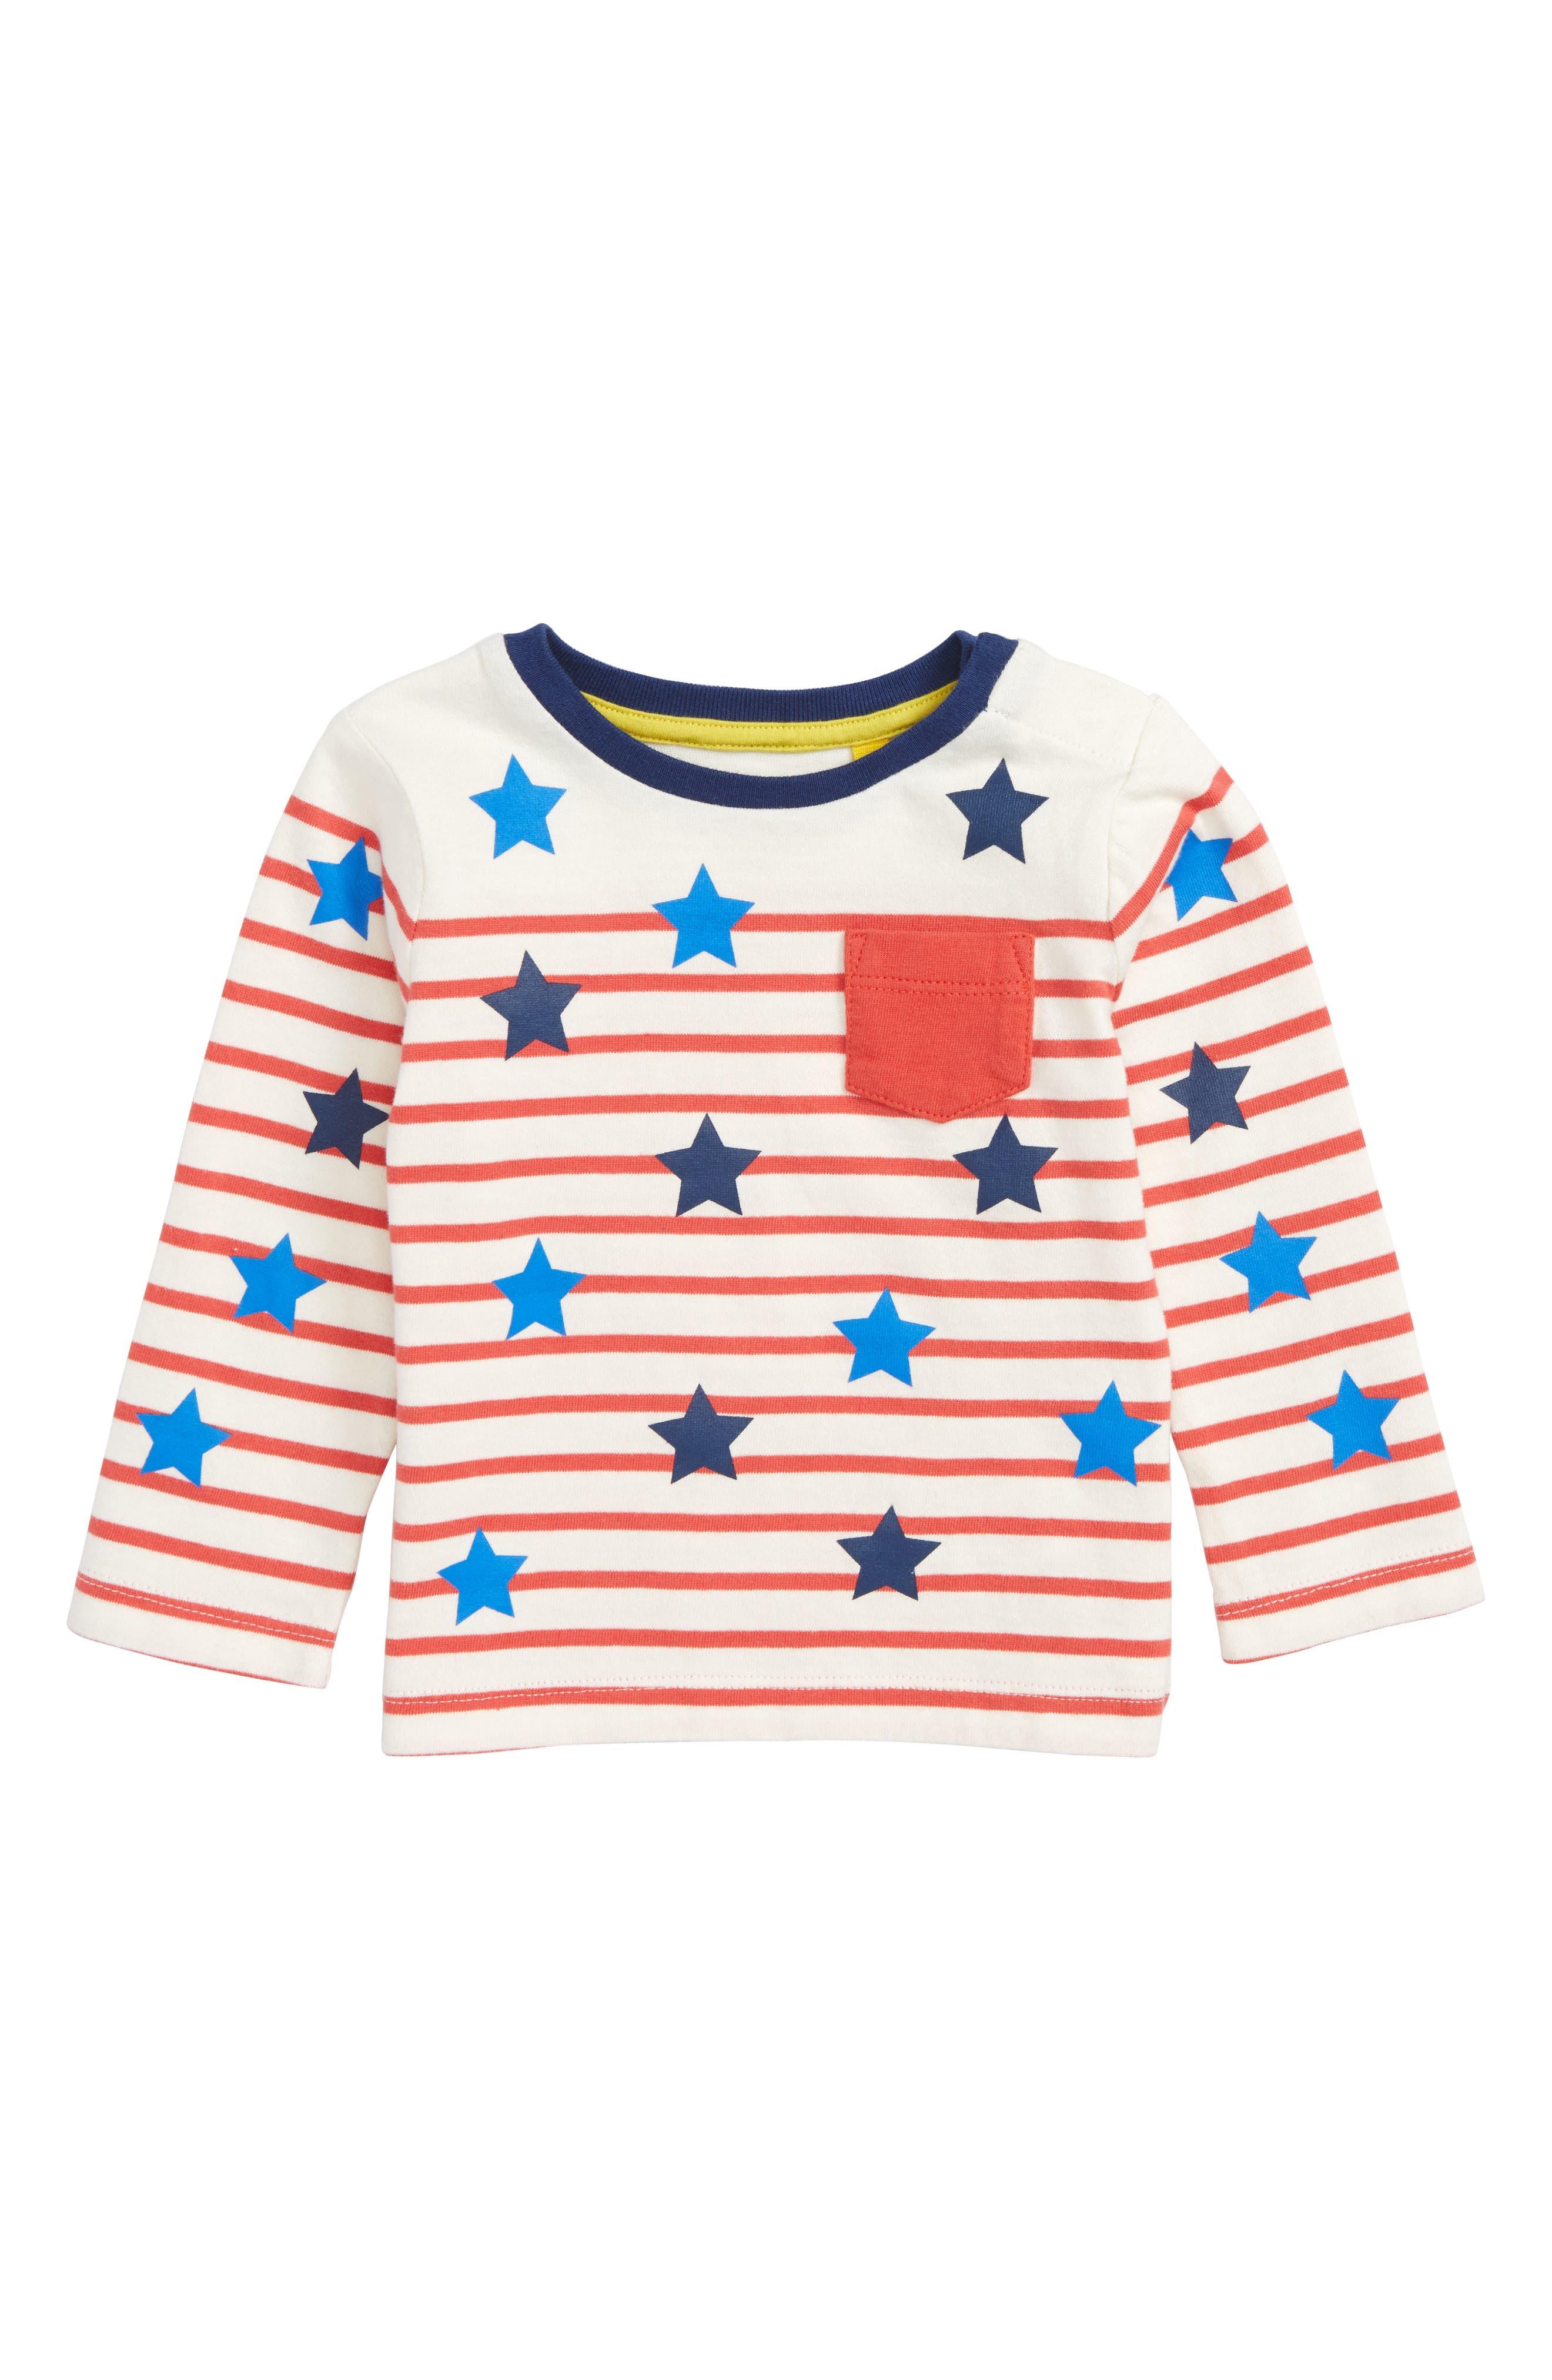 Alternate Image 1 Selected - Mini Boden Fun Breton T-Shirt (Baby Boys & Toddler Boys)